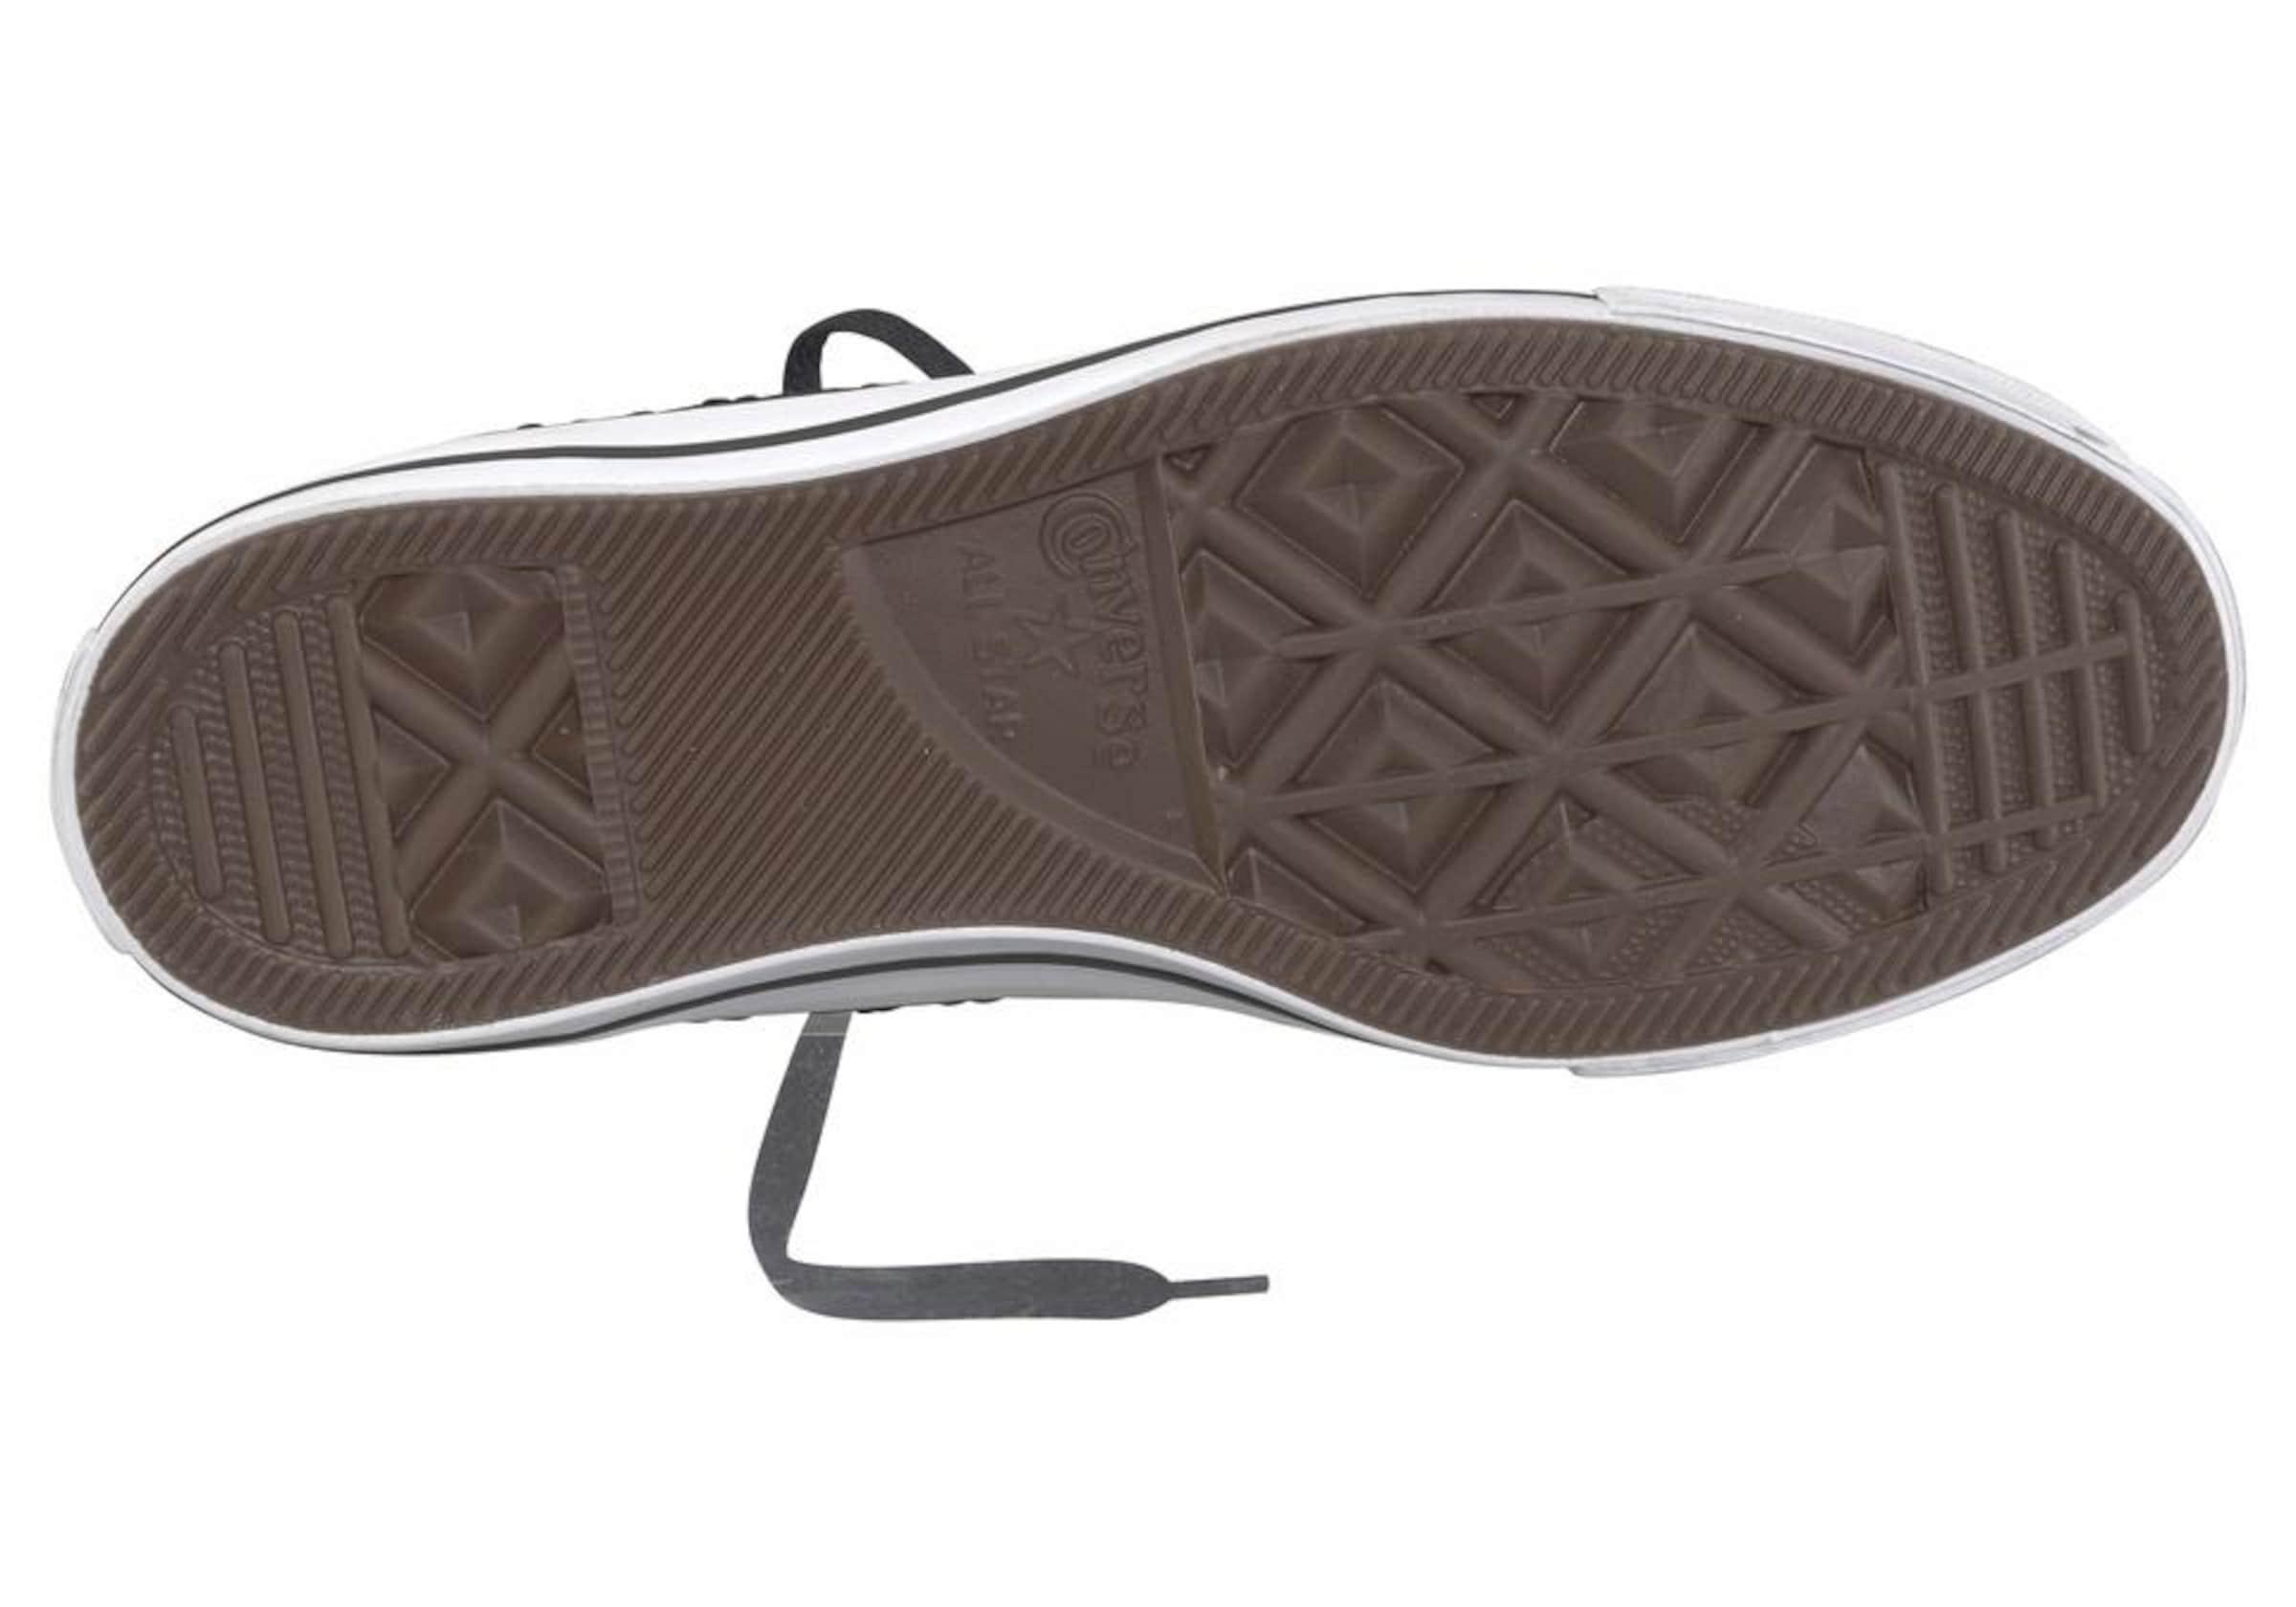 CONVERSE Sneaker 'Chuck Taylor All S' Empfehlen Rabatt QTWDv4AB